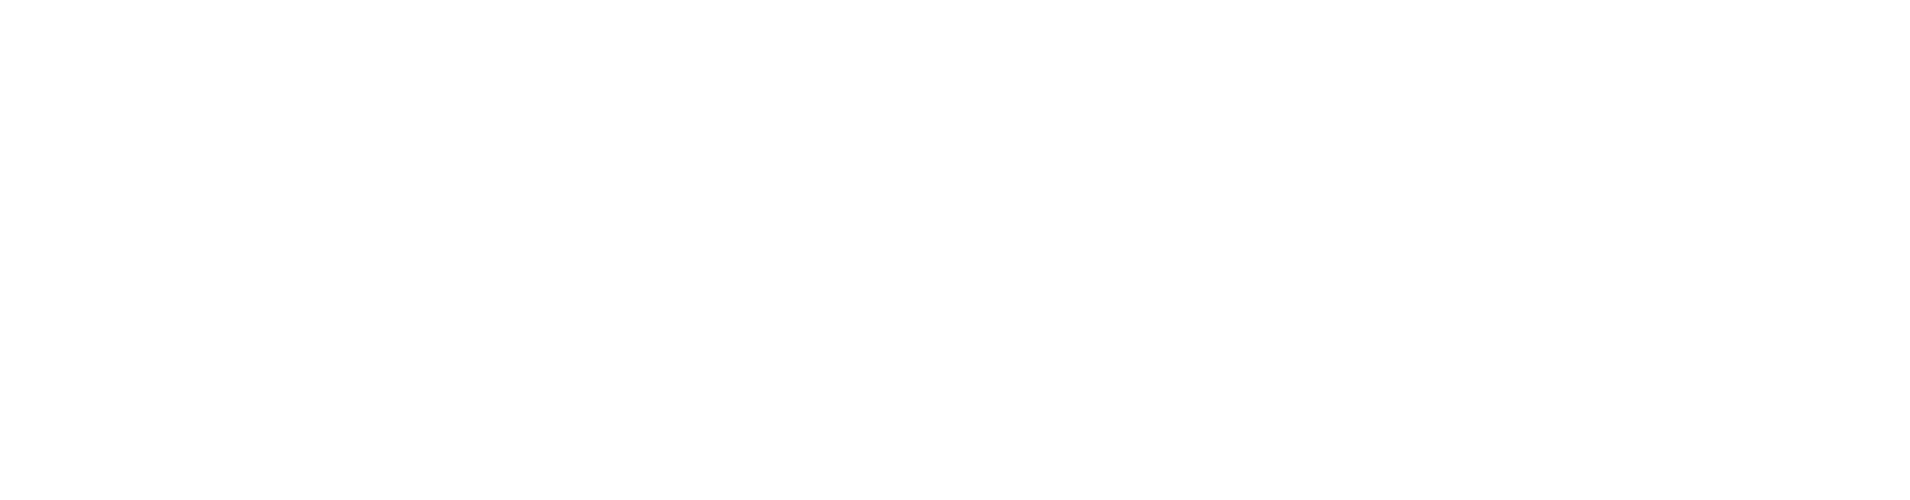 hachette-nashville logo